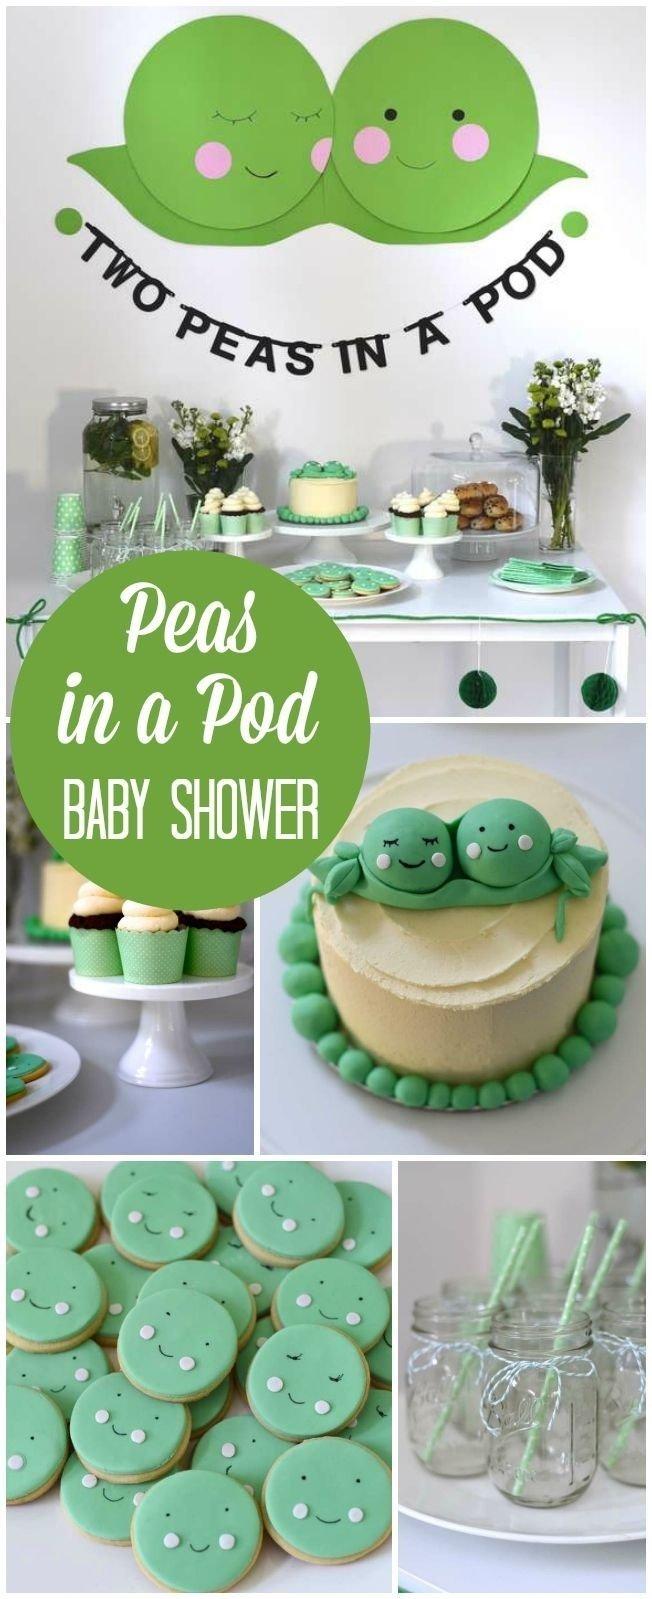 10 Cute Twin Baby Shower Theme Ideas innovative ideas twin baby shower amazing best 25 showers on